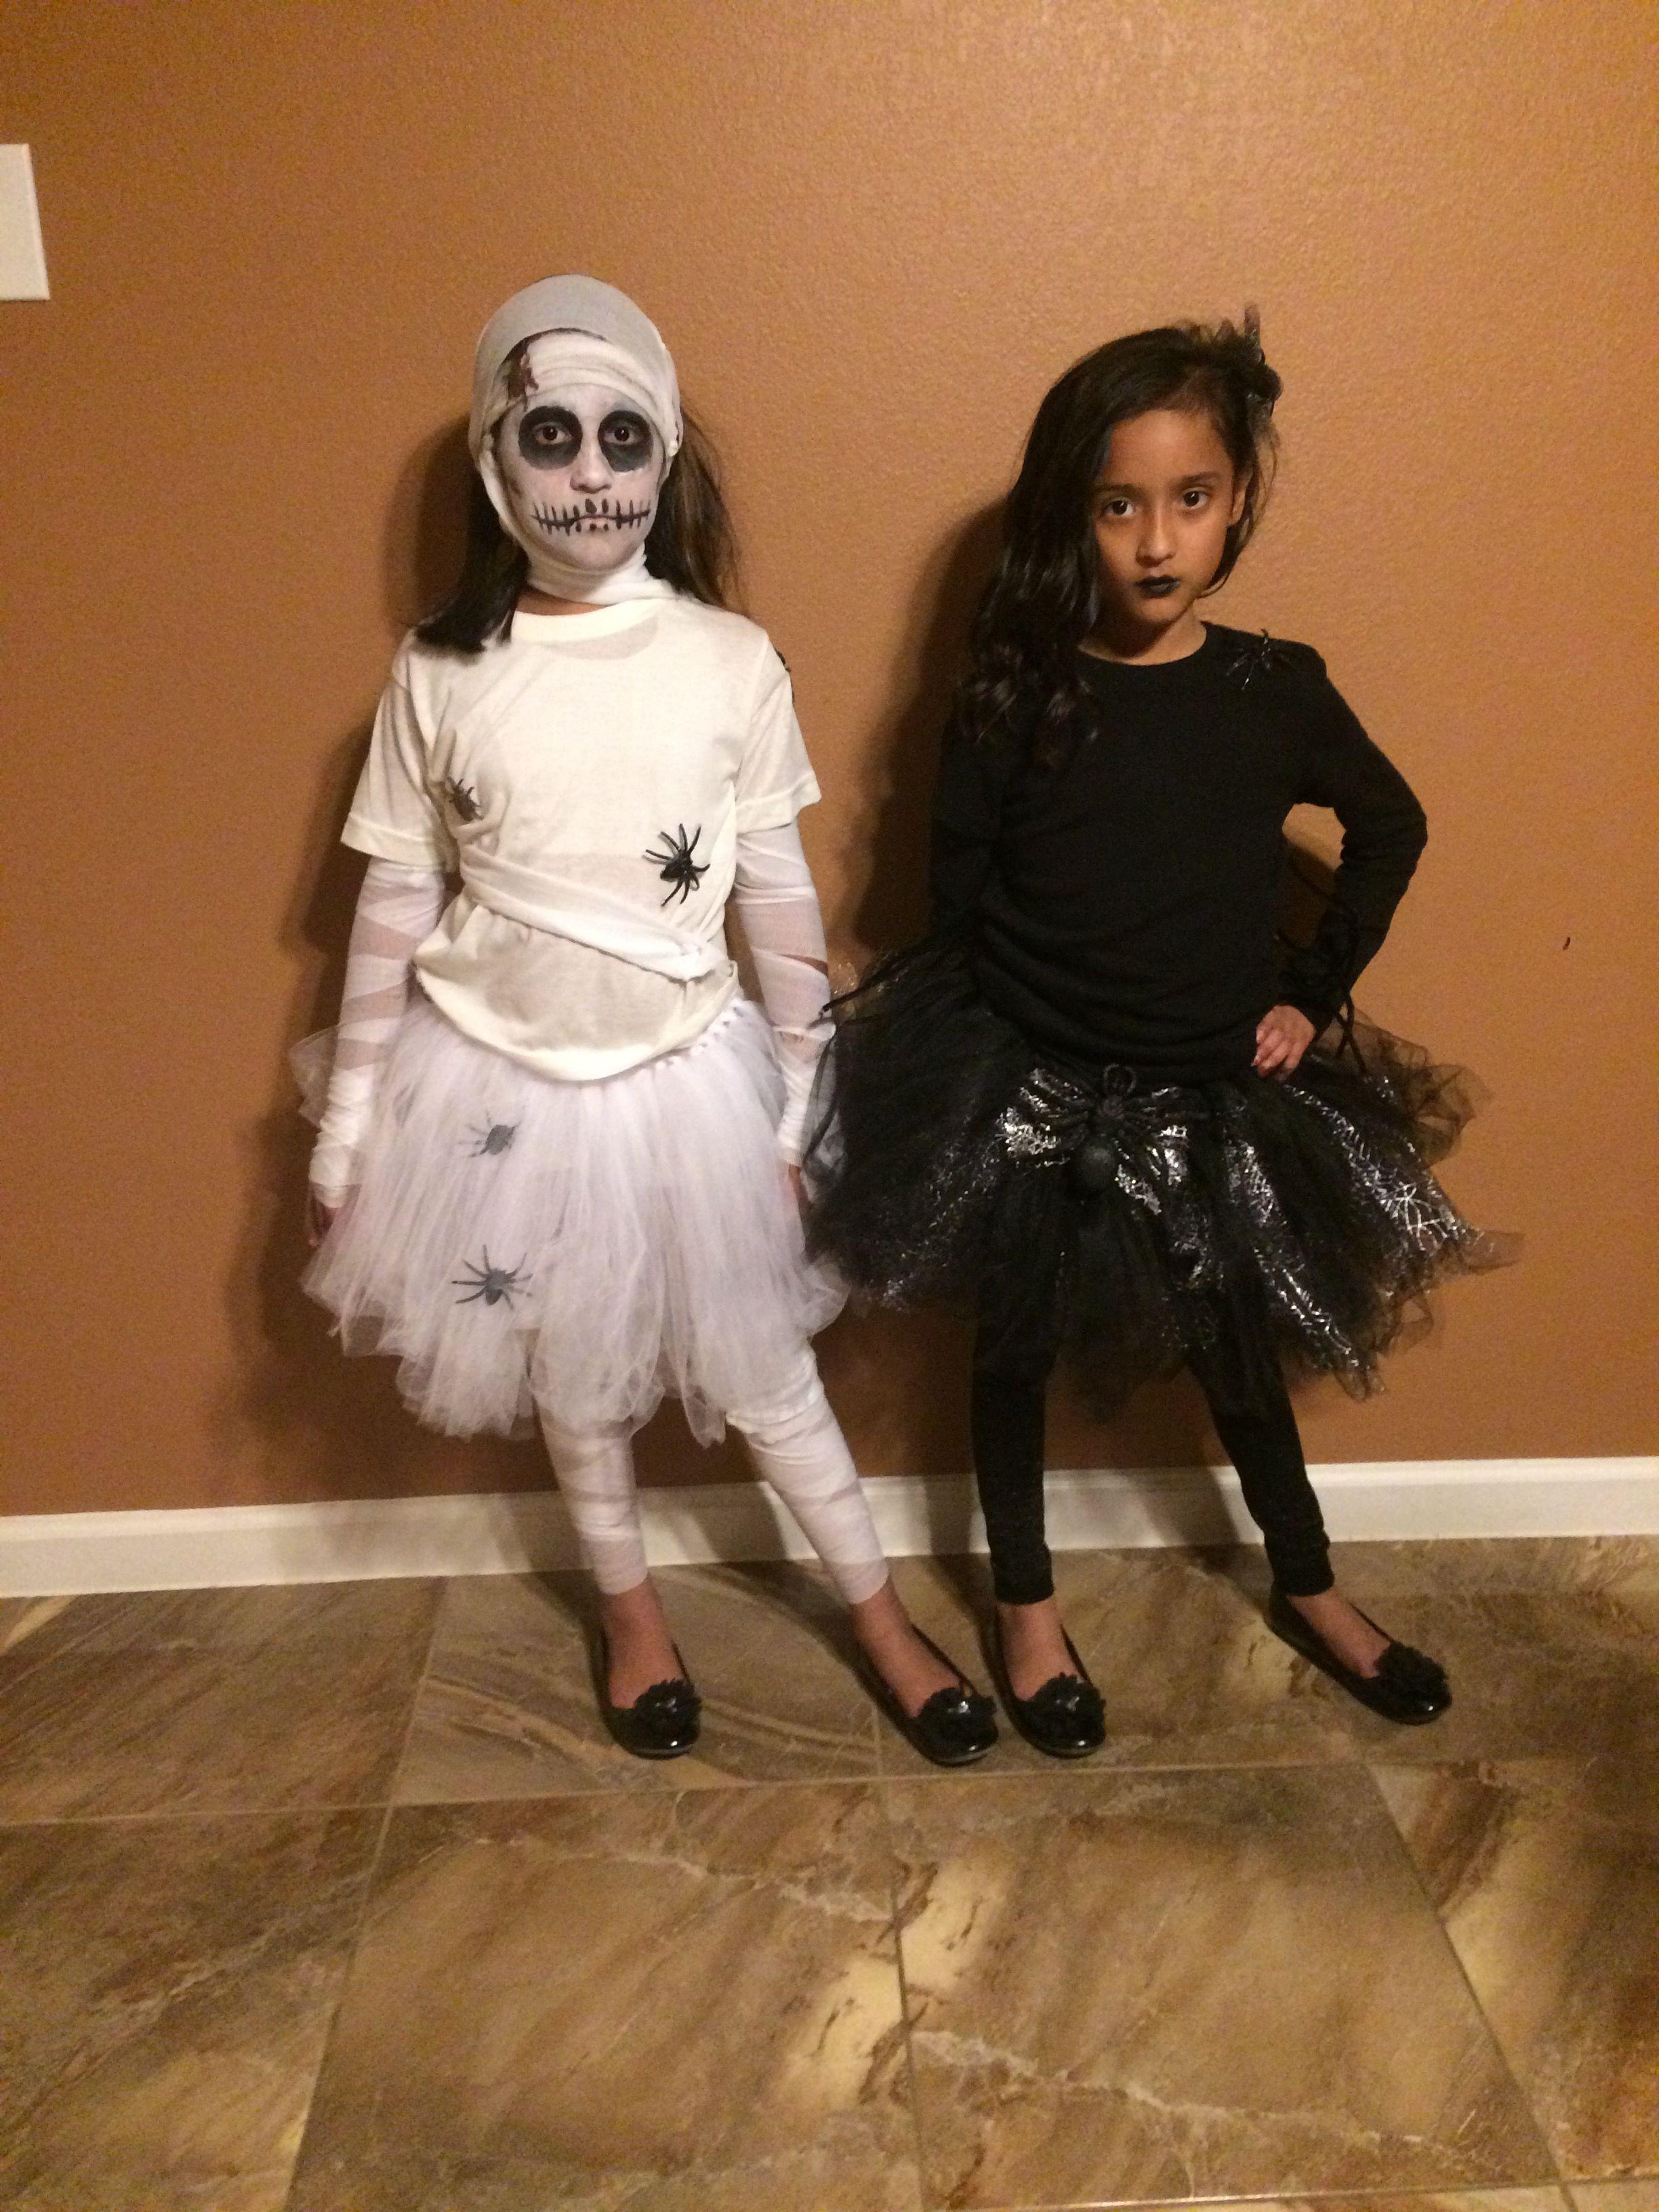 My girls Kasandra & Kayla in our DIY mummy & spider